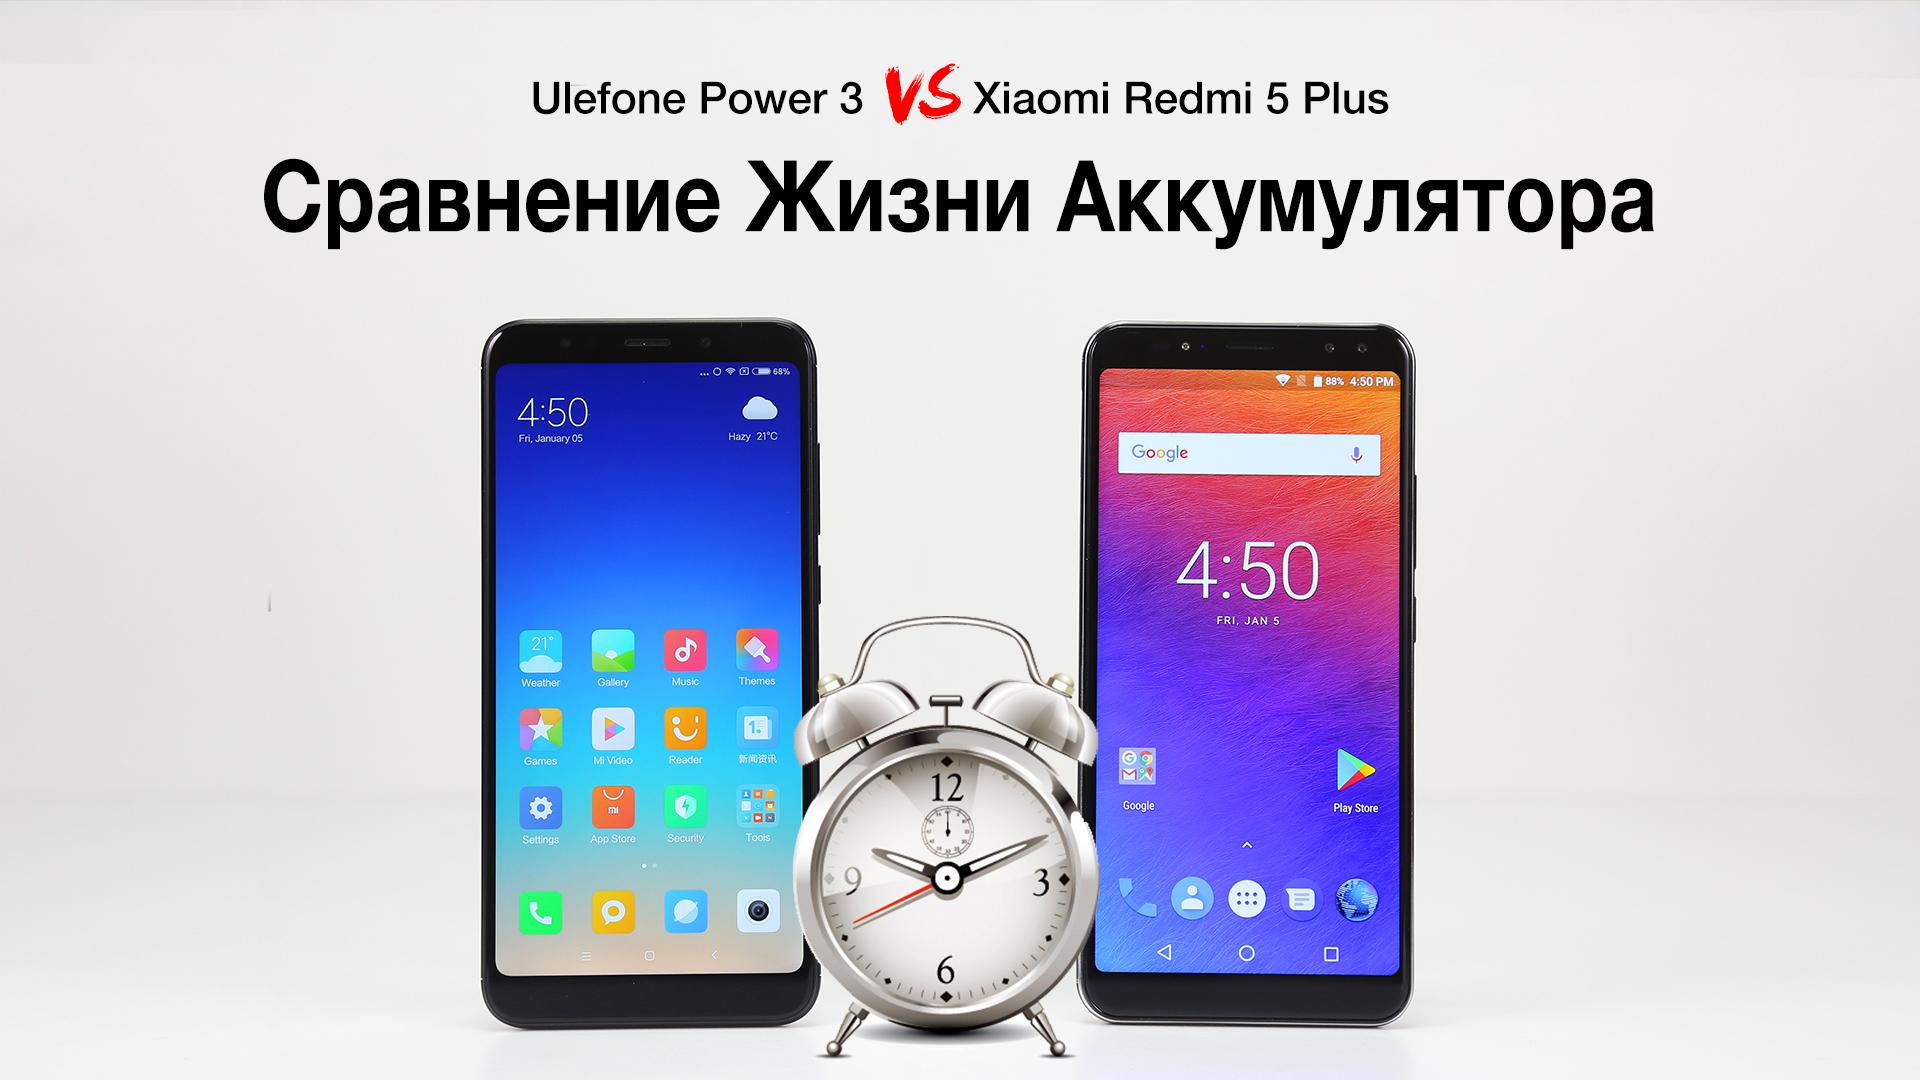 Сравнение автономности Ulefone Power 3 с Xiaomi Redmi 5 Plus